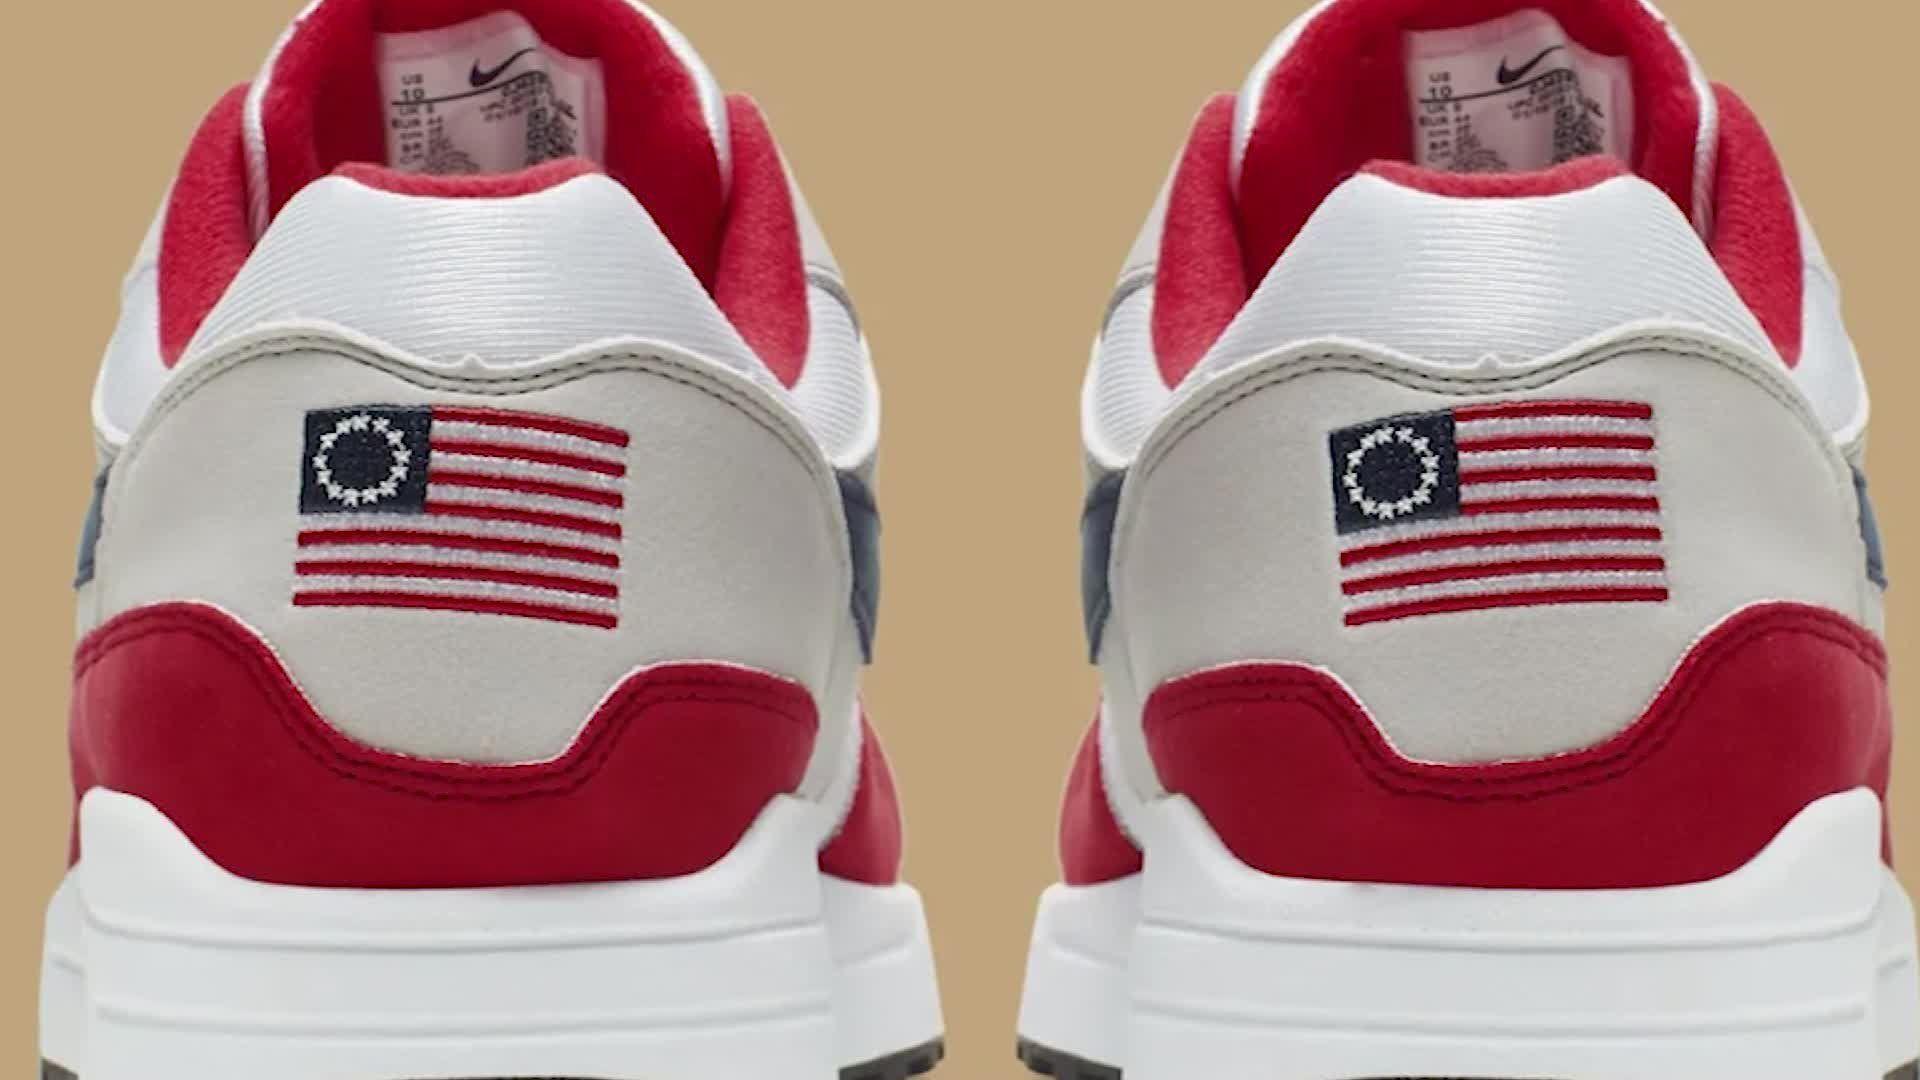 Nike cancels flag shoes amid Kaepernick